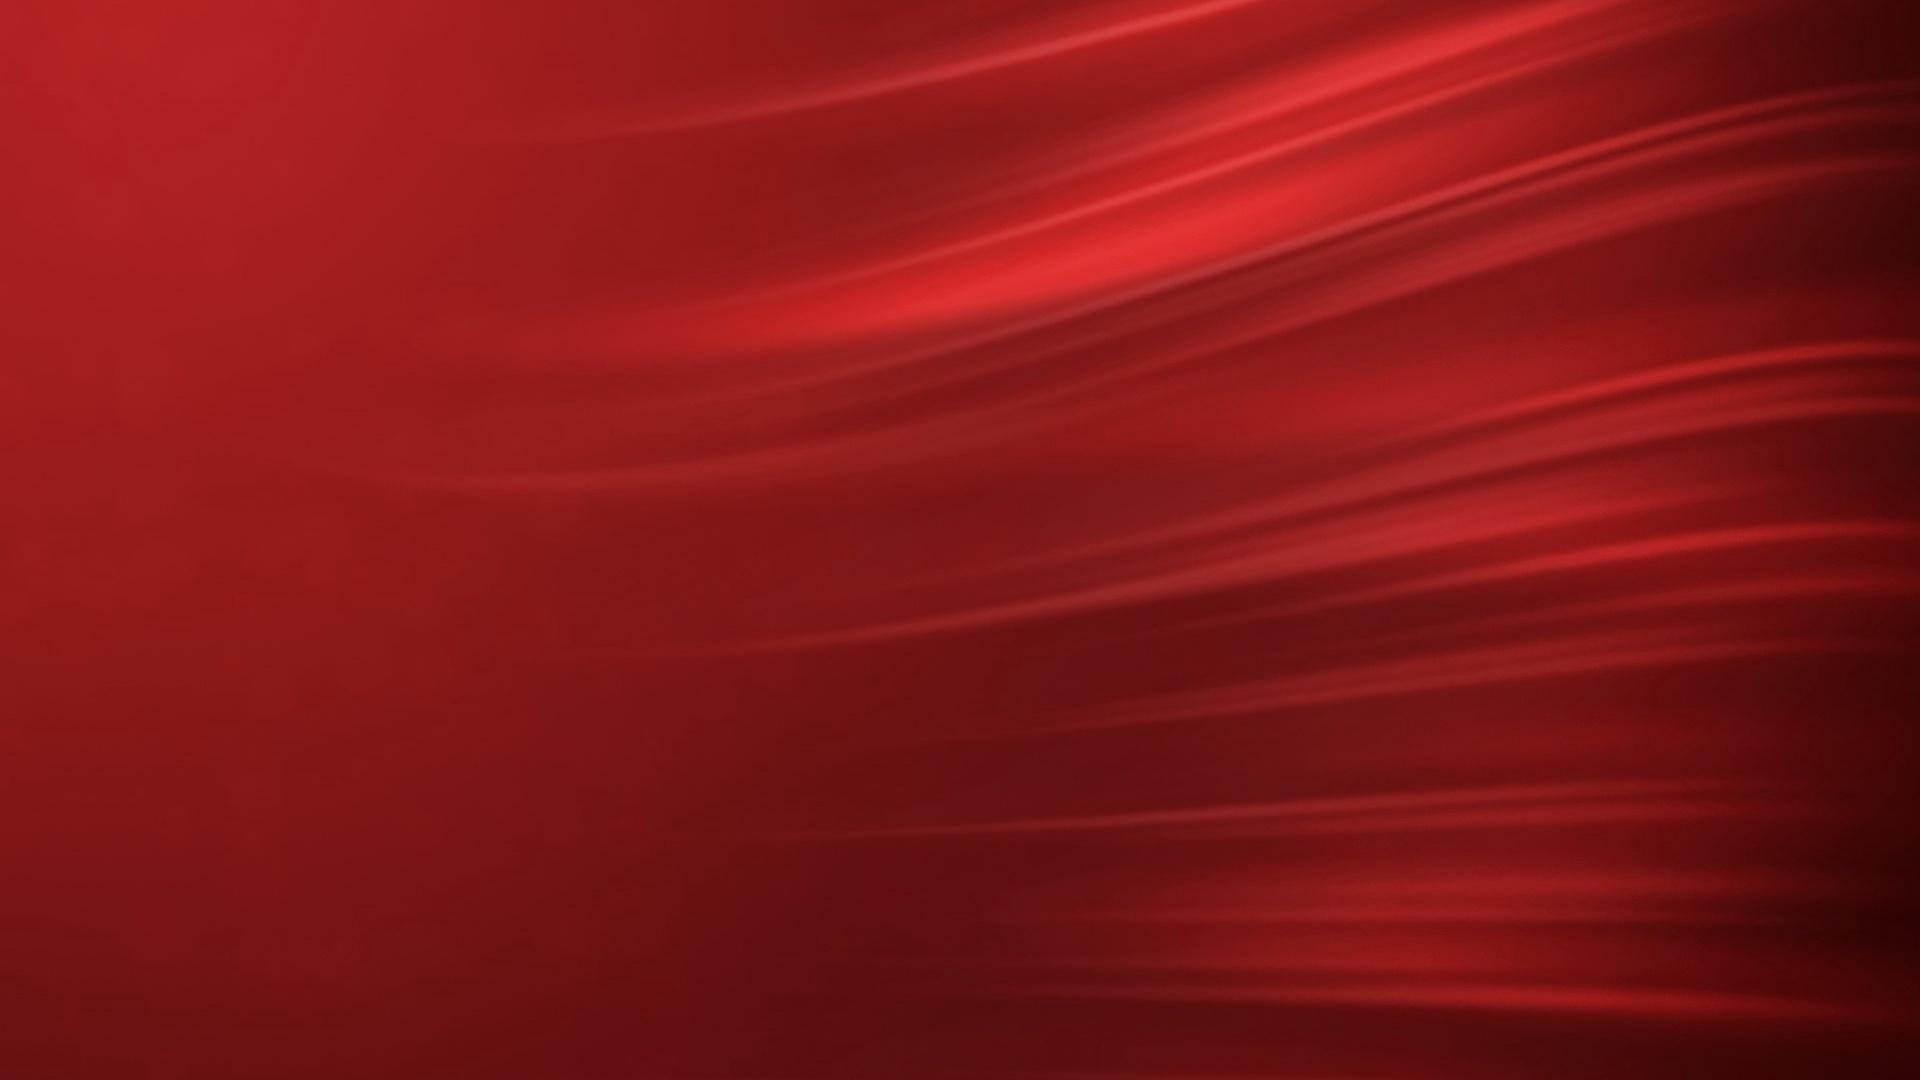 Solid Red full wallpaper